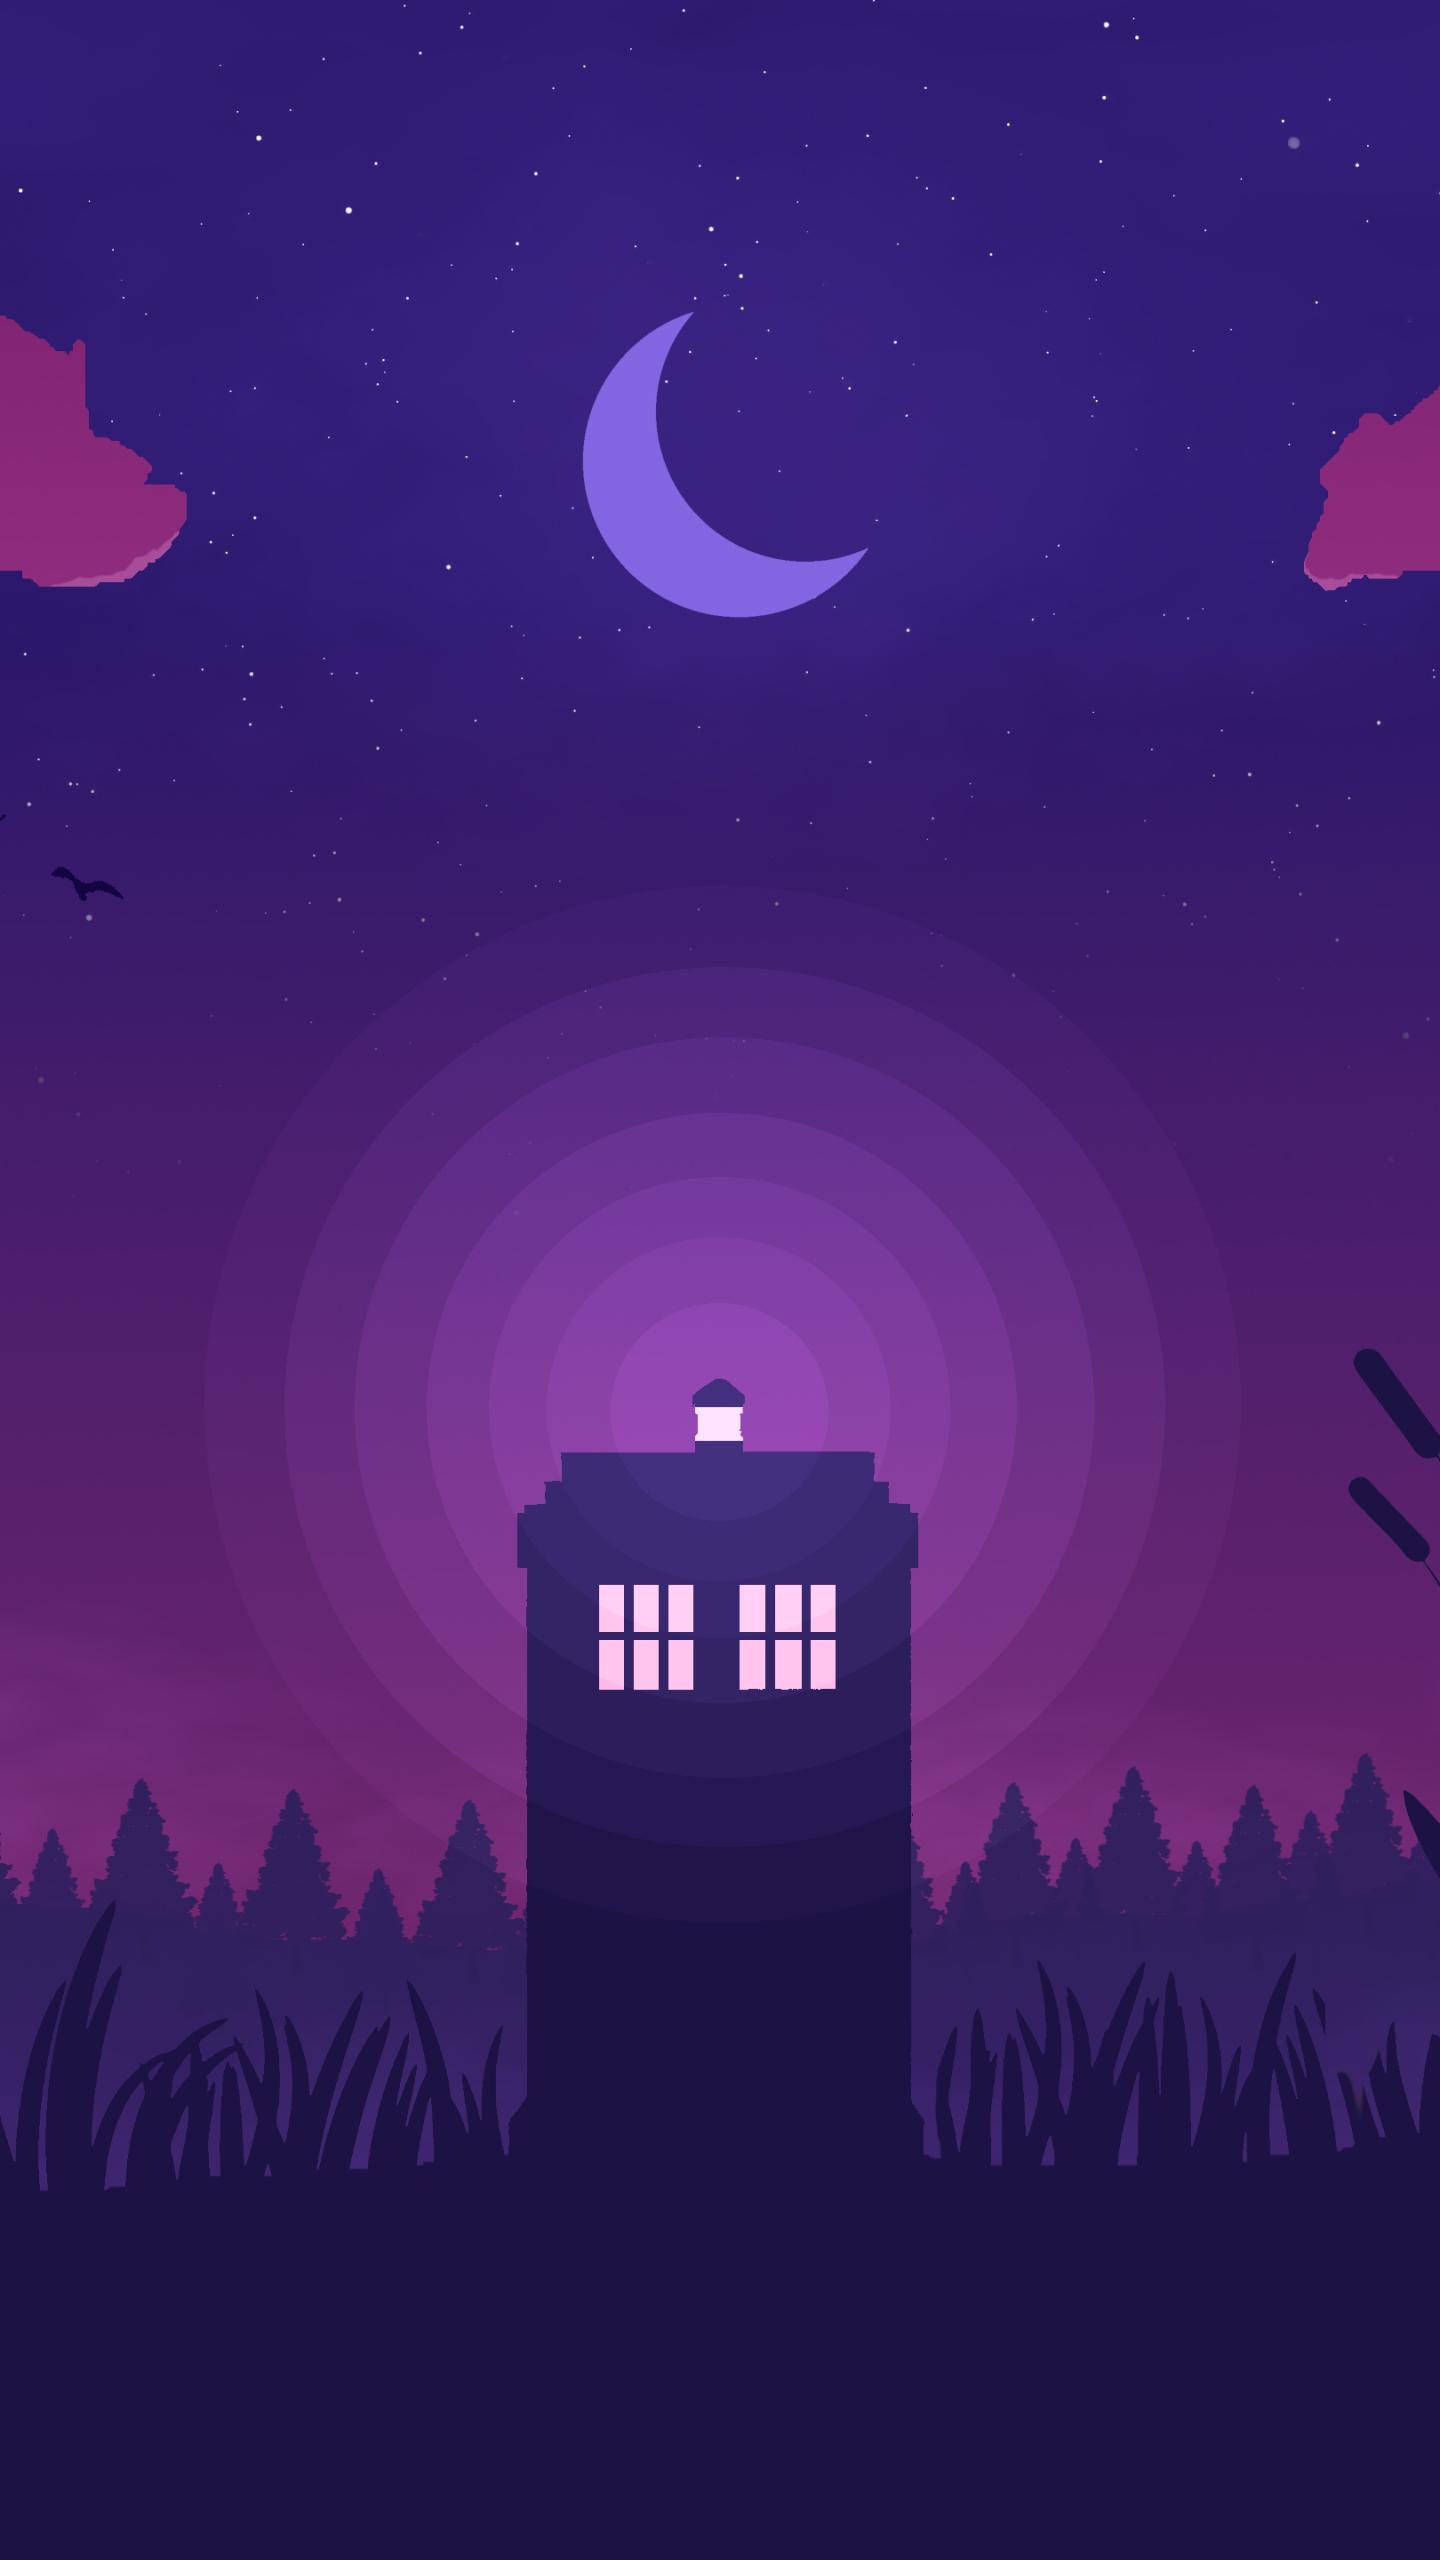 Minimalist Iphone Wallpaper 11 Pro Max Minimalist Doctor Who Phone 1080x1920 Download Hd Wallpaper Wallpapertip